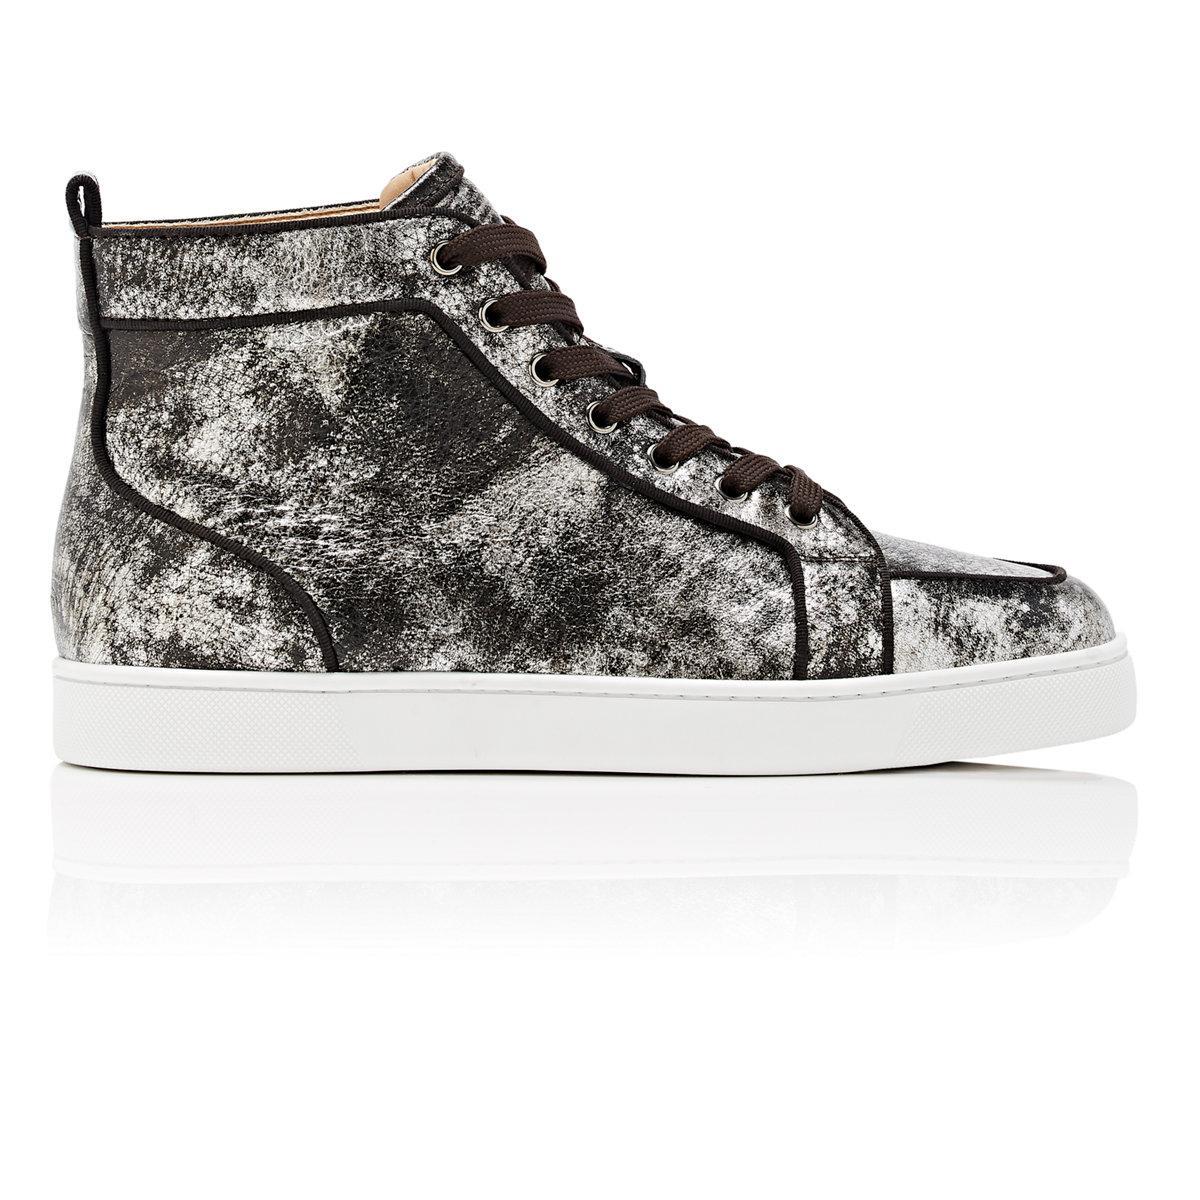 911ae1eb5d57 ... clearance christian louboutin. womens metallic rantus orlato flat  leather sneakers a3678 886fd